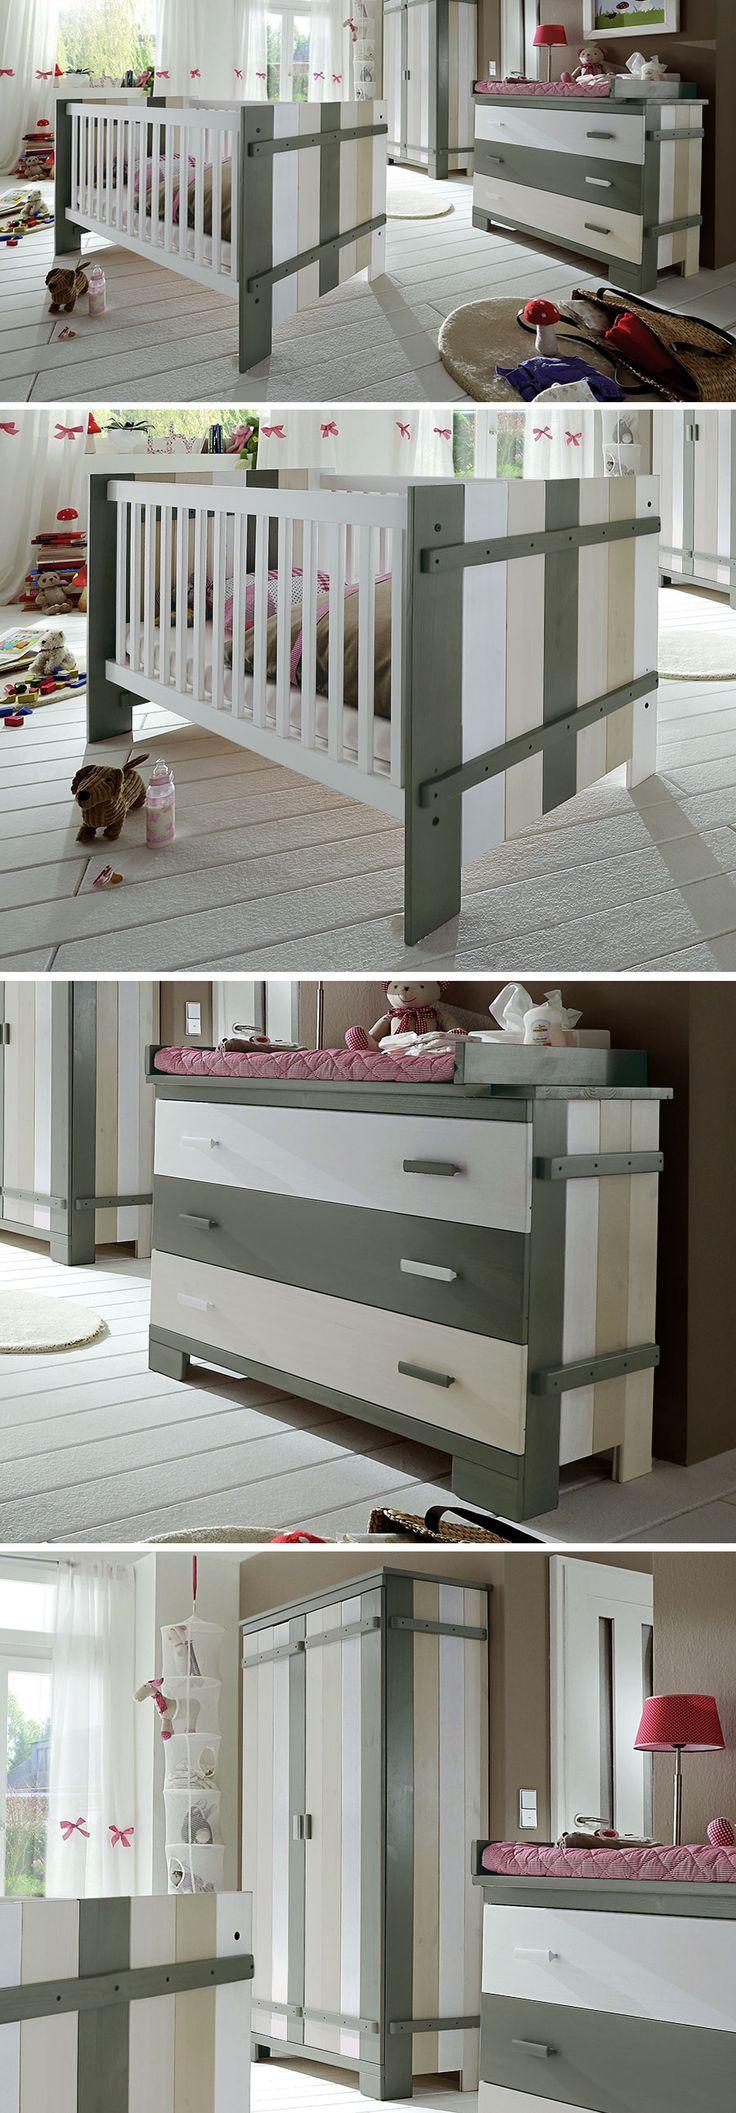 Babyzimmer möbel natur  106 best Babyzimmer images on Pinterest | Babies, Baby zimmer and ...